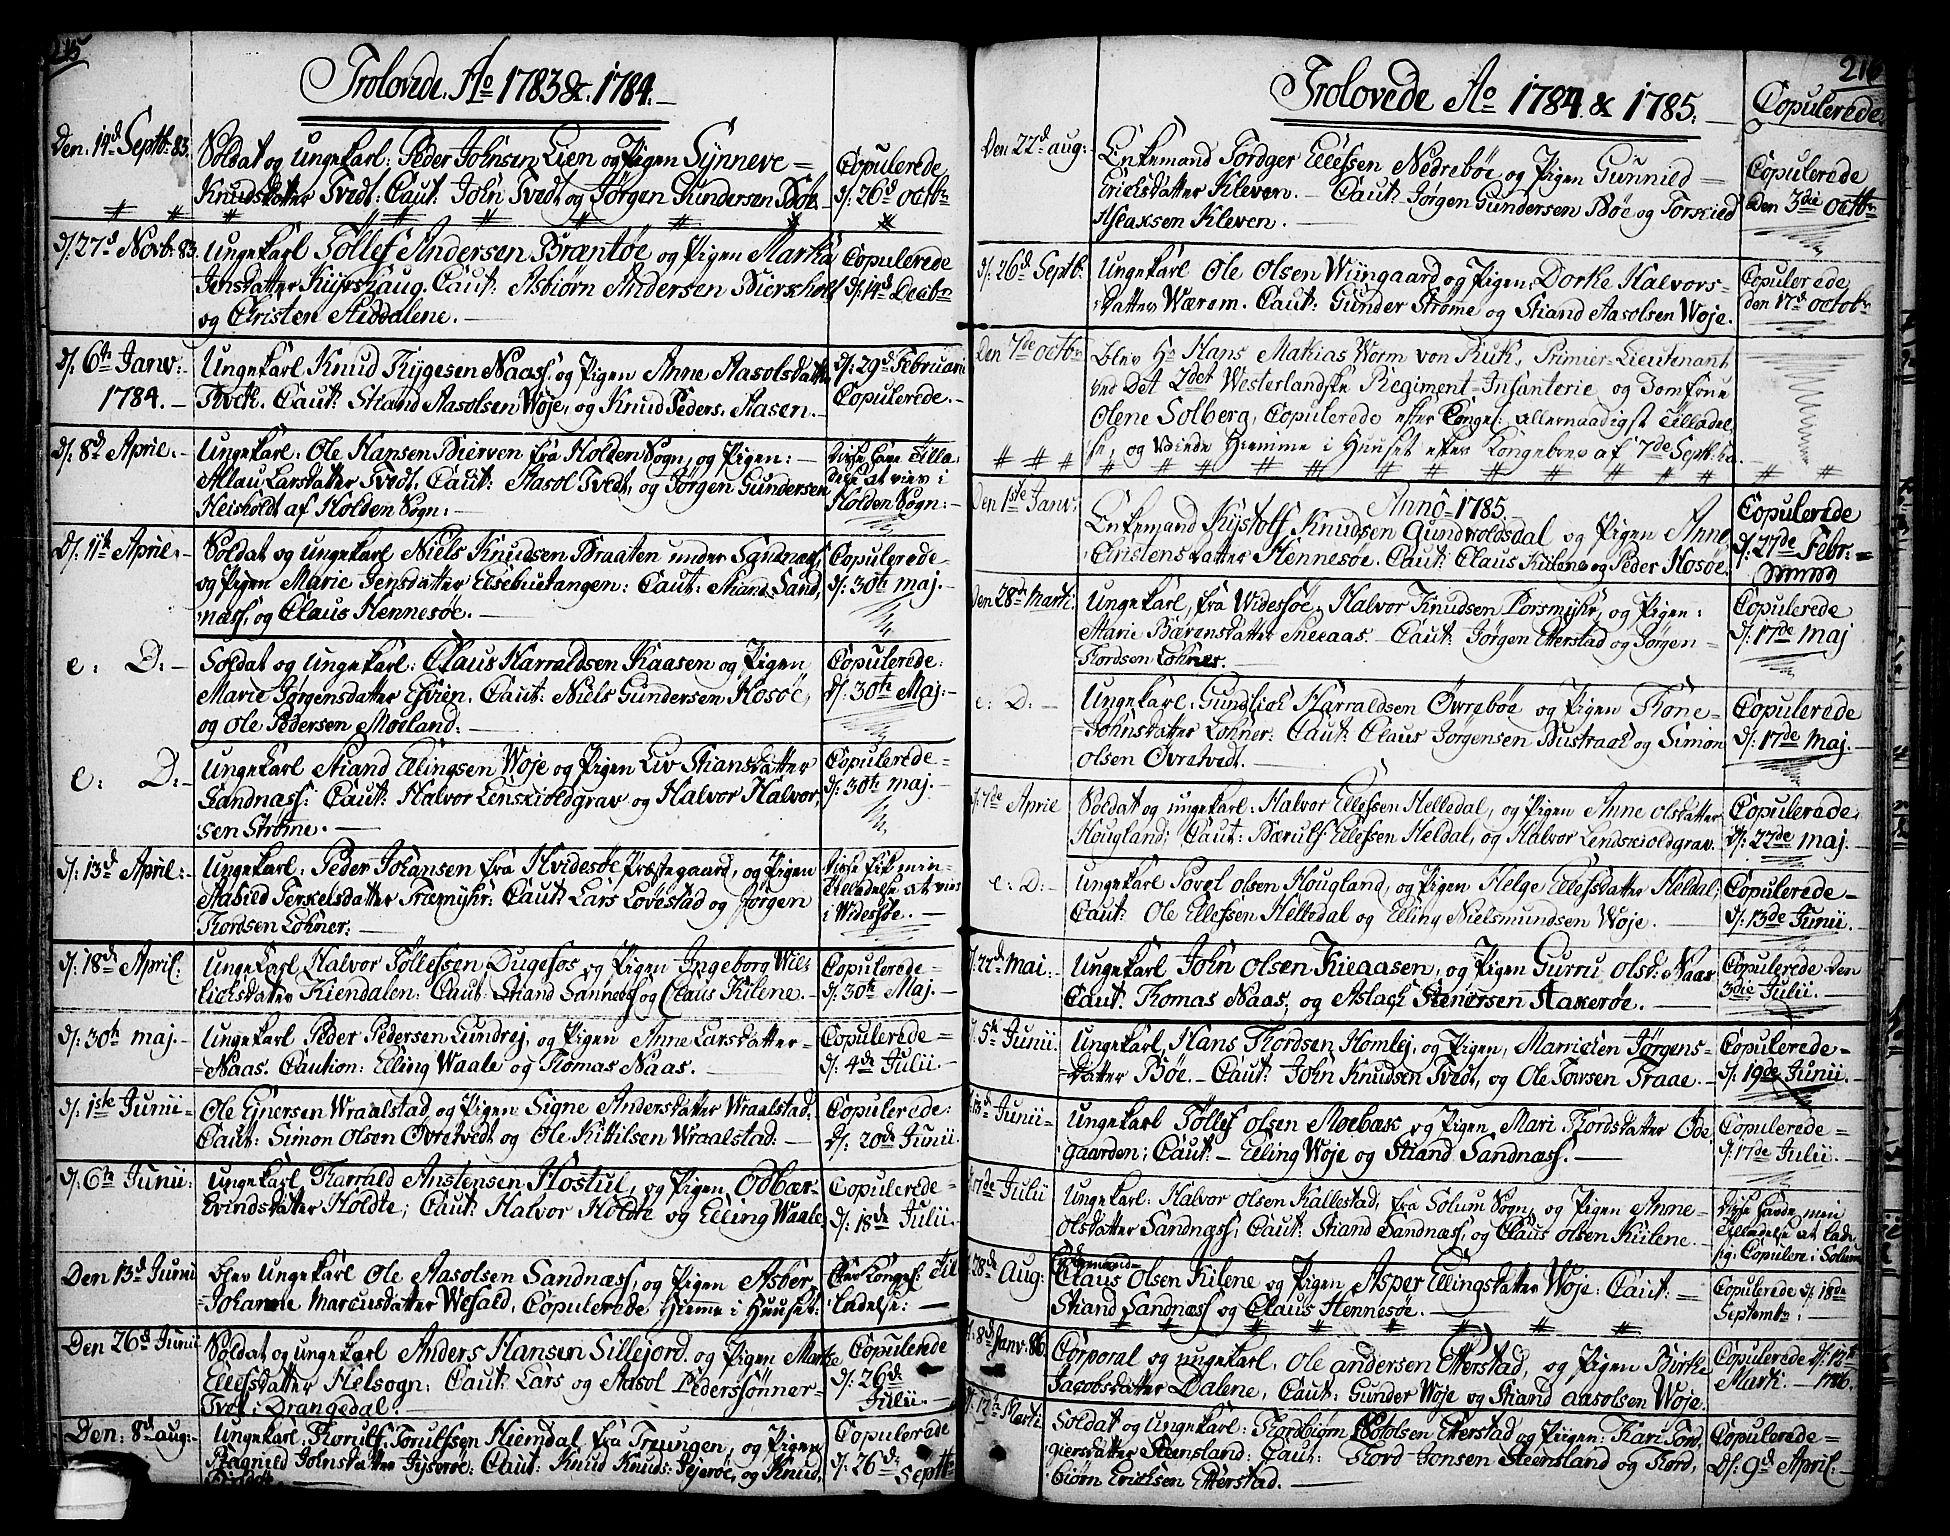 SAKO, Drangedal kirkebøker, F/Fa/L0003: Ministerialbok nr. 3, 1768-1814, s. 215-216